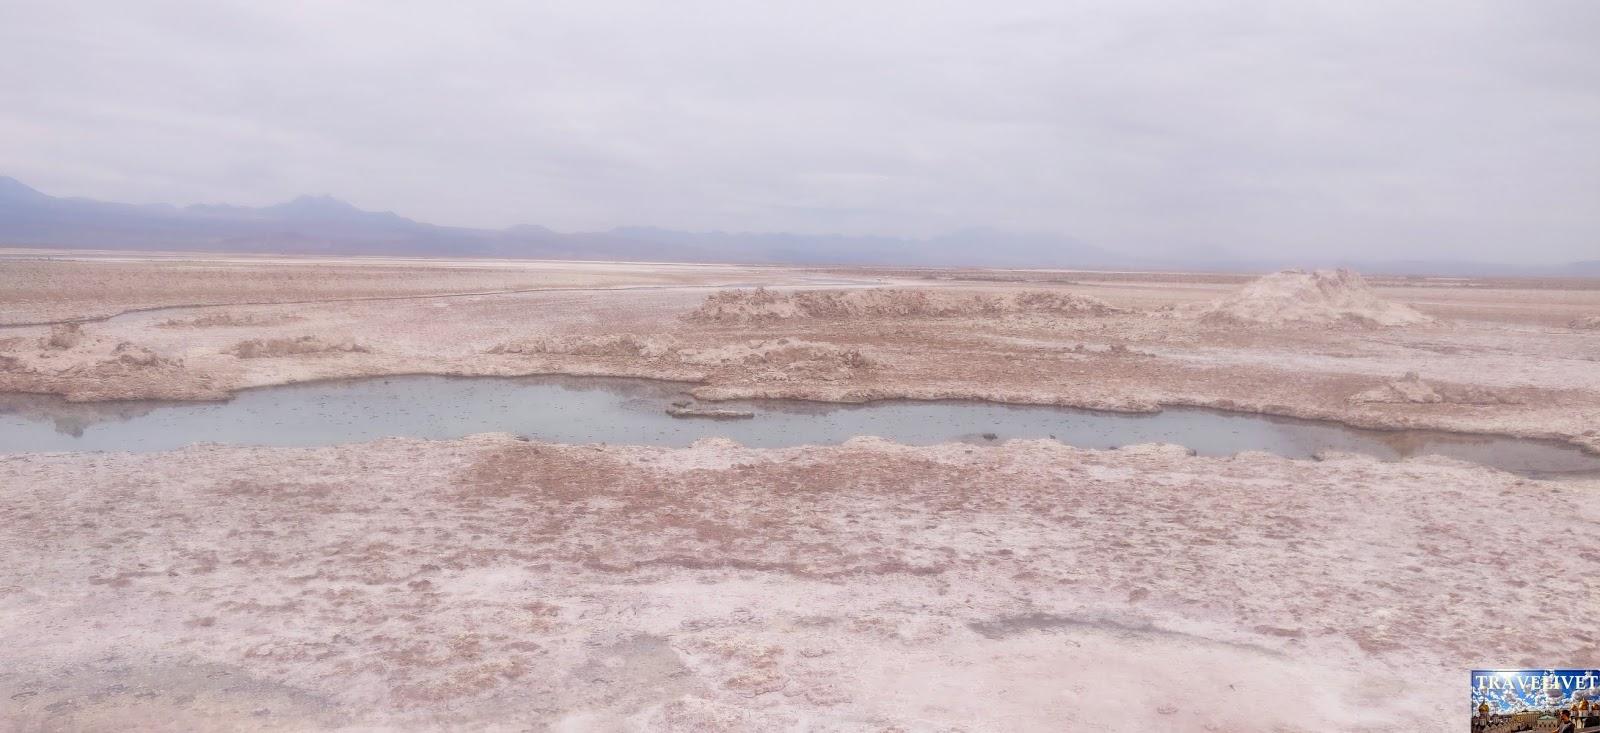 Chili Chile San Pedro de Atacama désert Laguna Chaxa